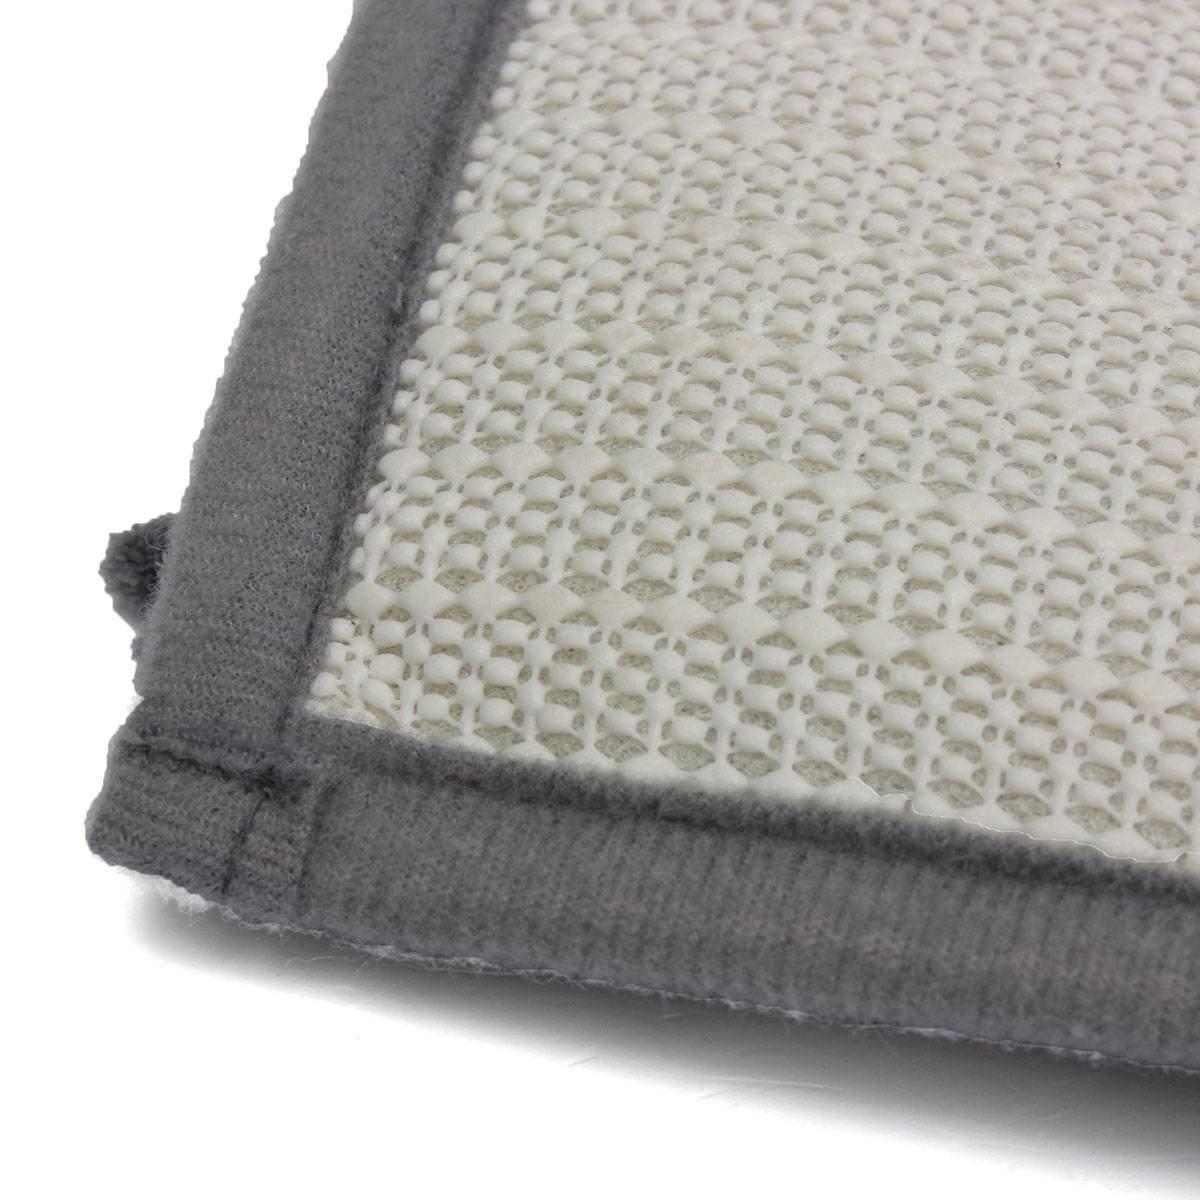 washable bathroom new shaggy rugs non slip bath mat thick